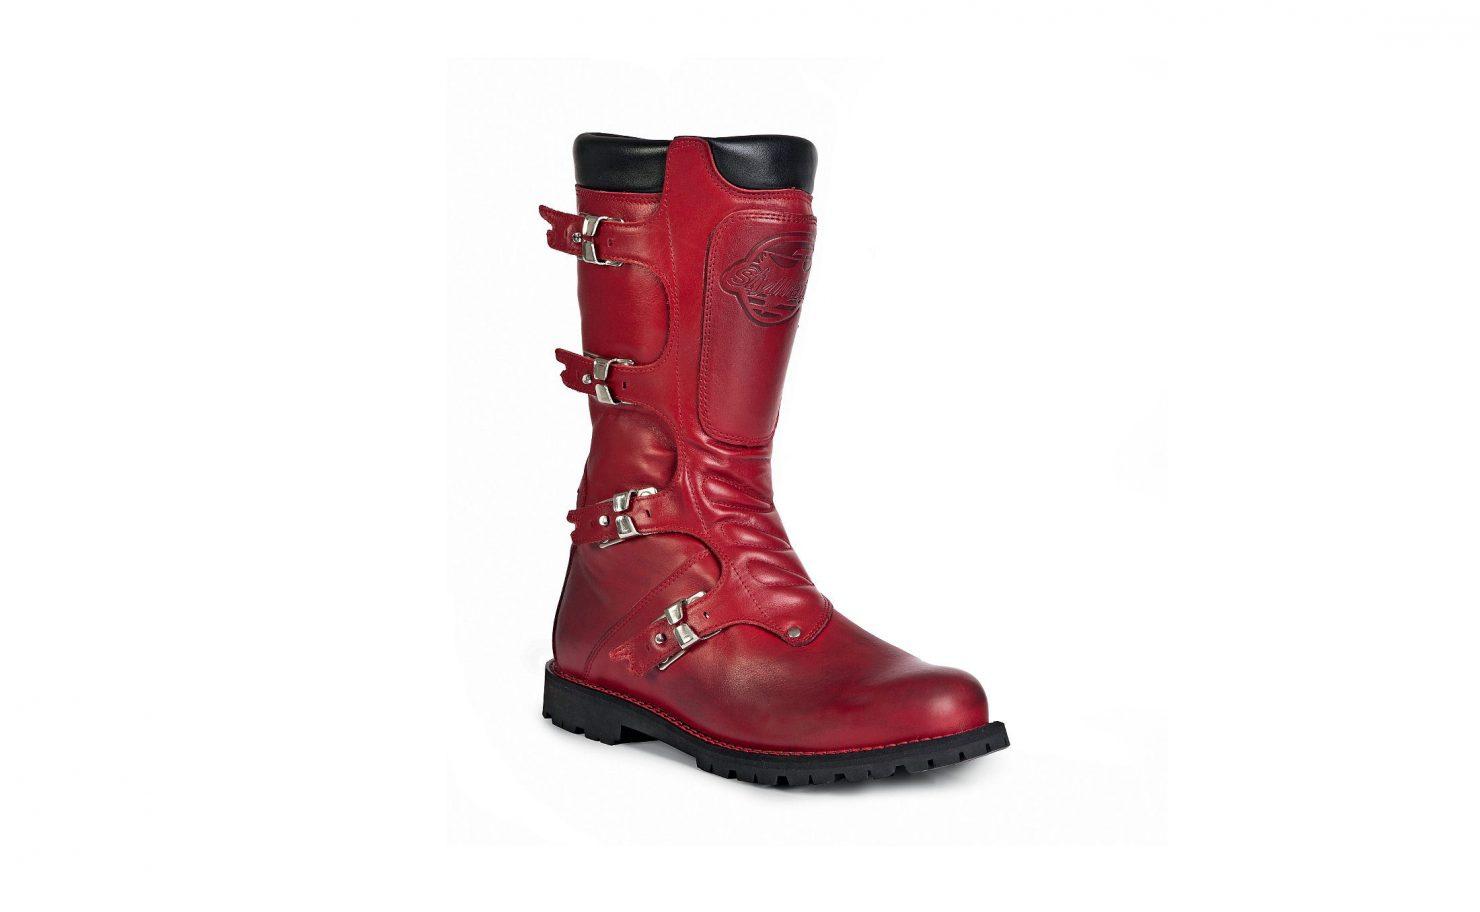 Stylmartin Continental Boots